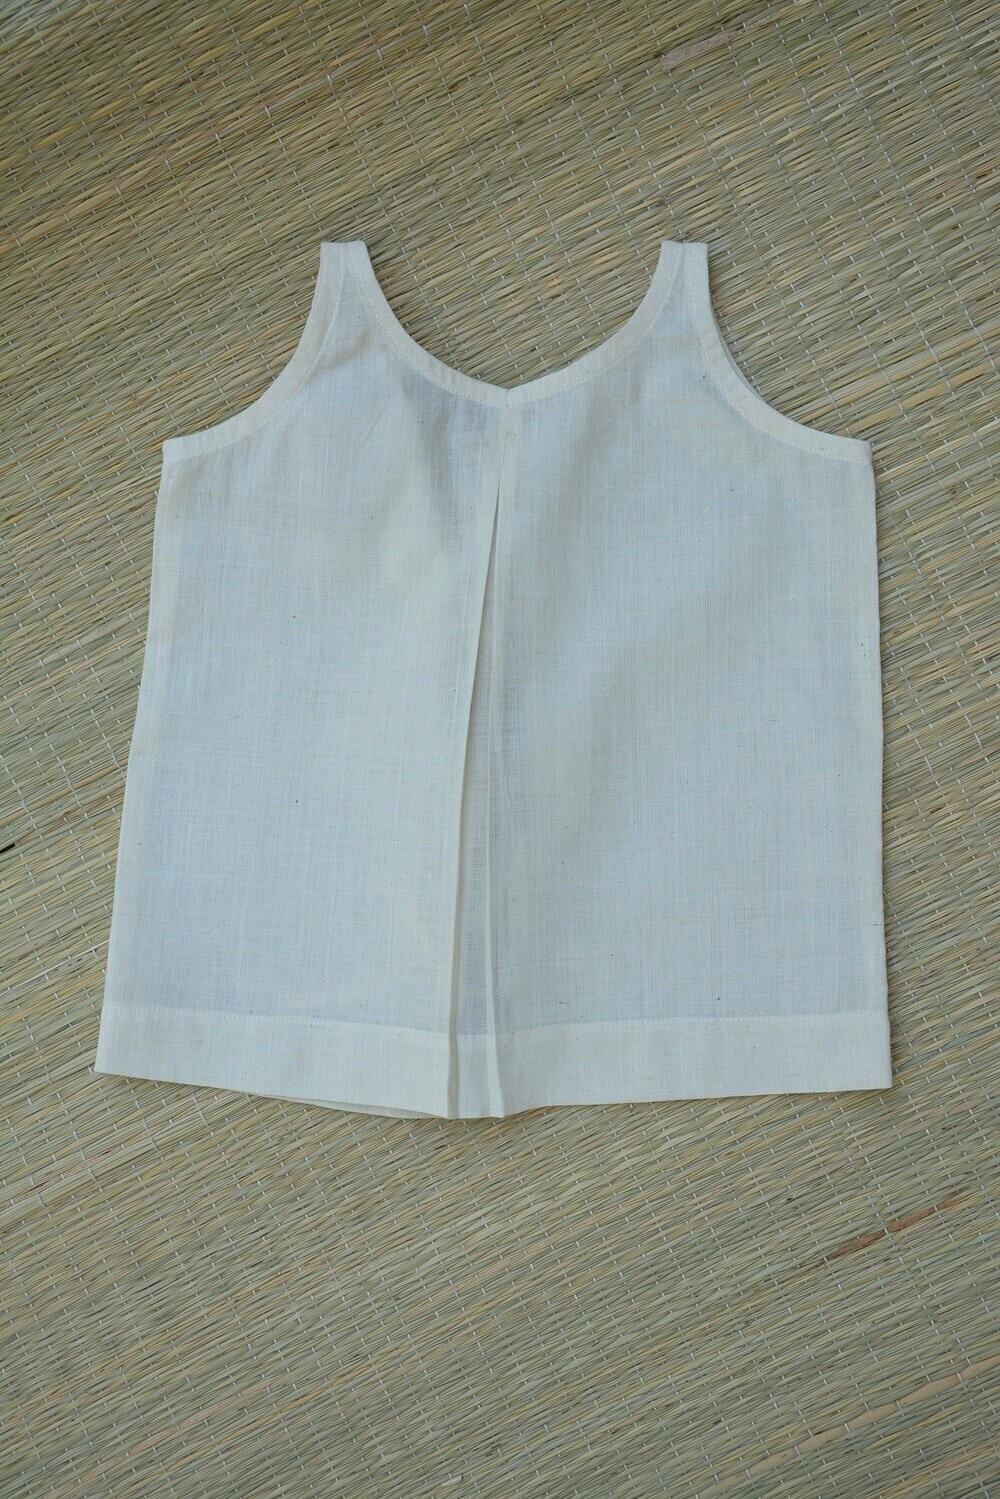 Ambara Charaka spun and Handwoven cotton muslin Jhabla for Infants (0 - 3 months) - Set of 5.